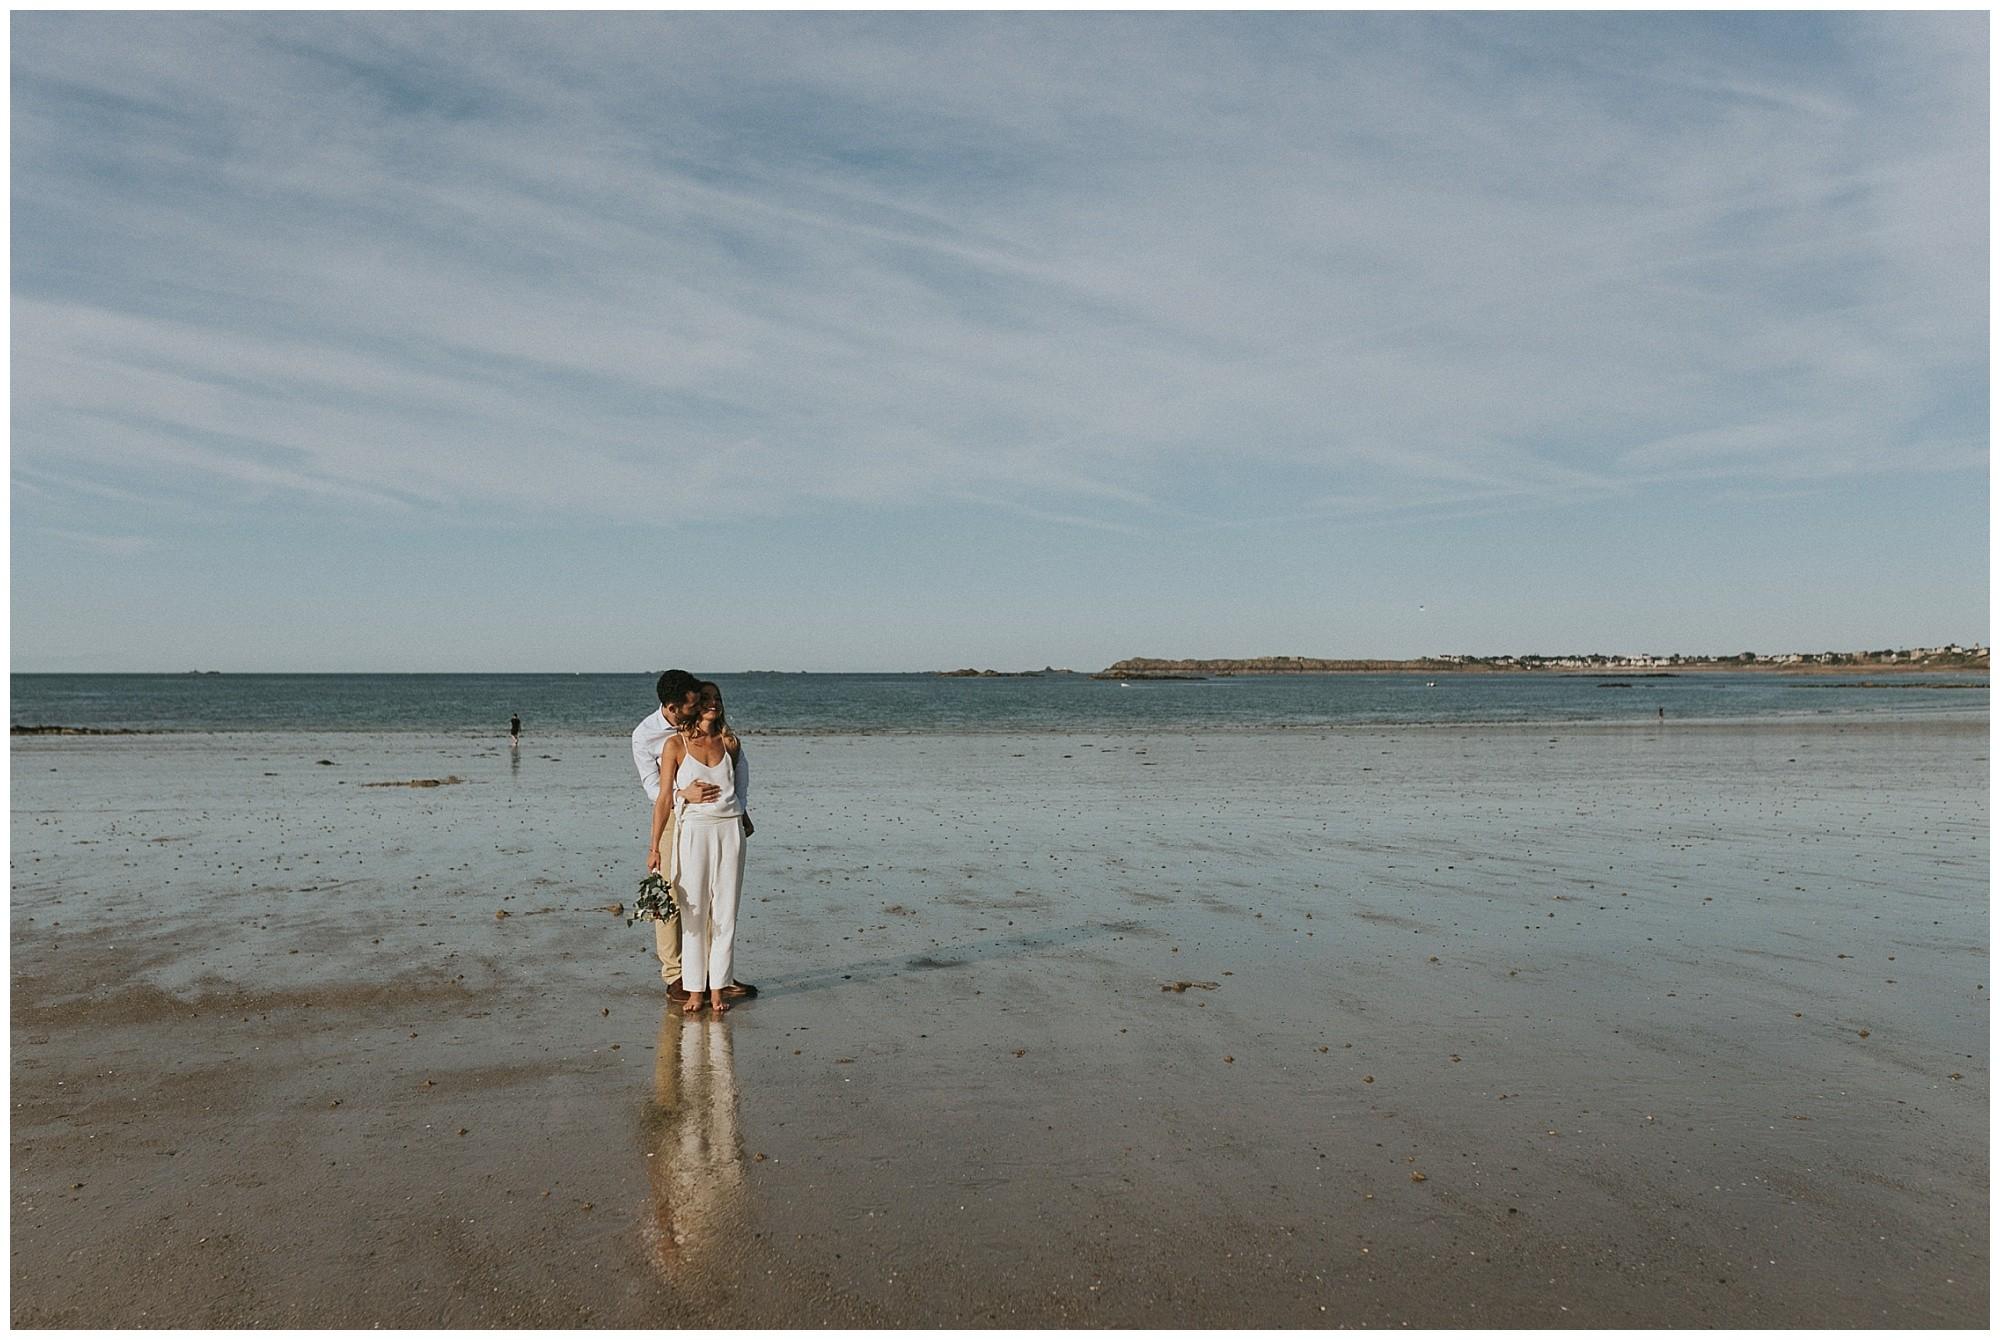 Kateryna-photos-photographe-mariage-bretagne-saint-malo-finistere-cotes-darmor-wedding_0067.jpg